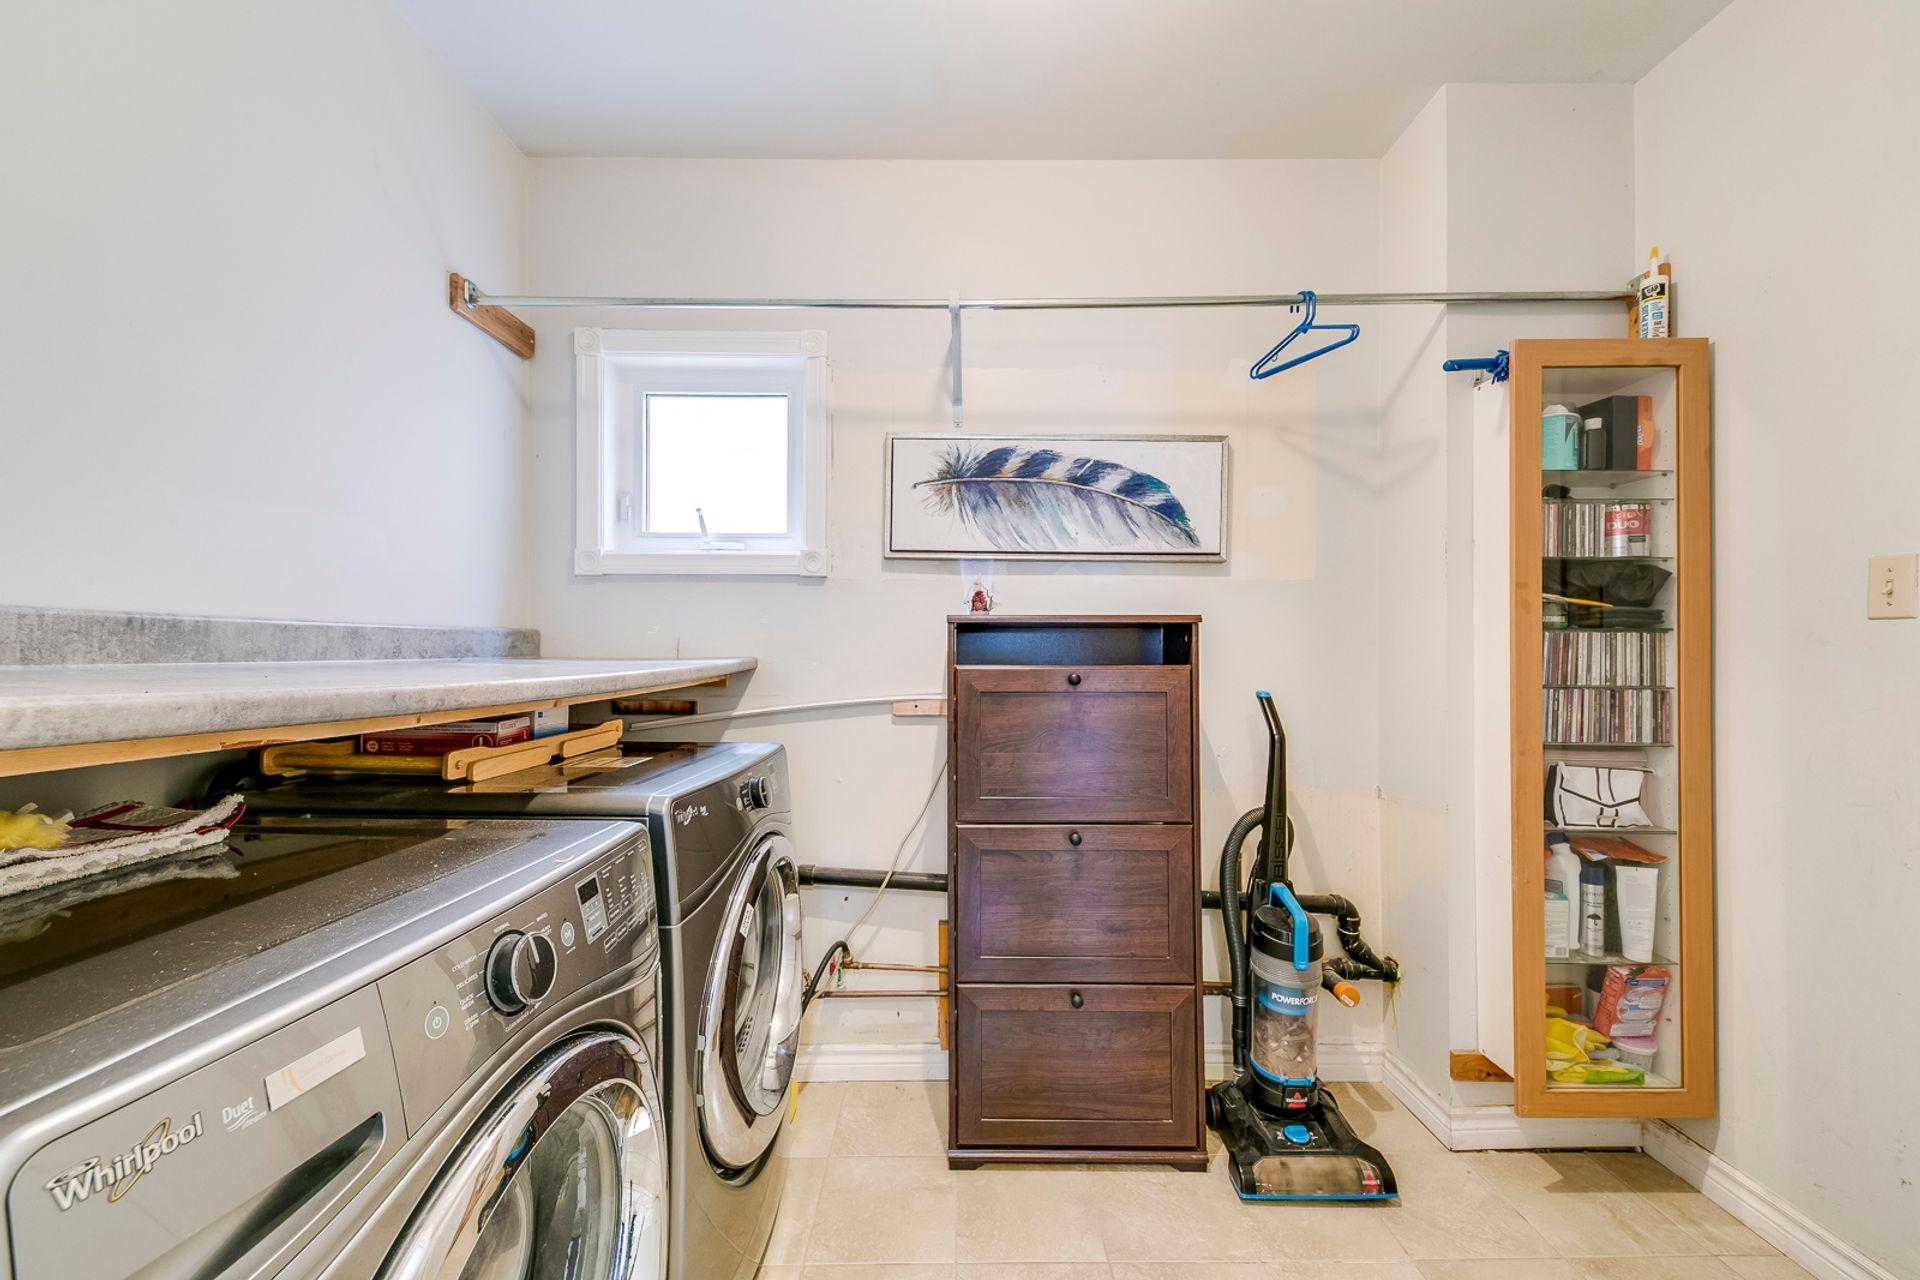 Laundry Room - 972 Winterton Way, Mississauga - Elite3 & Team at 972 Winterton Way, East Credit, Mississauga